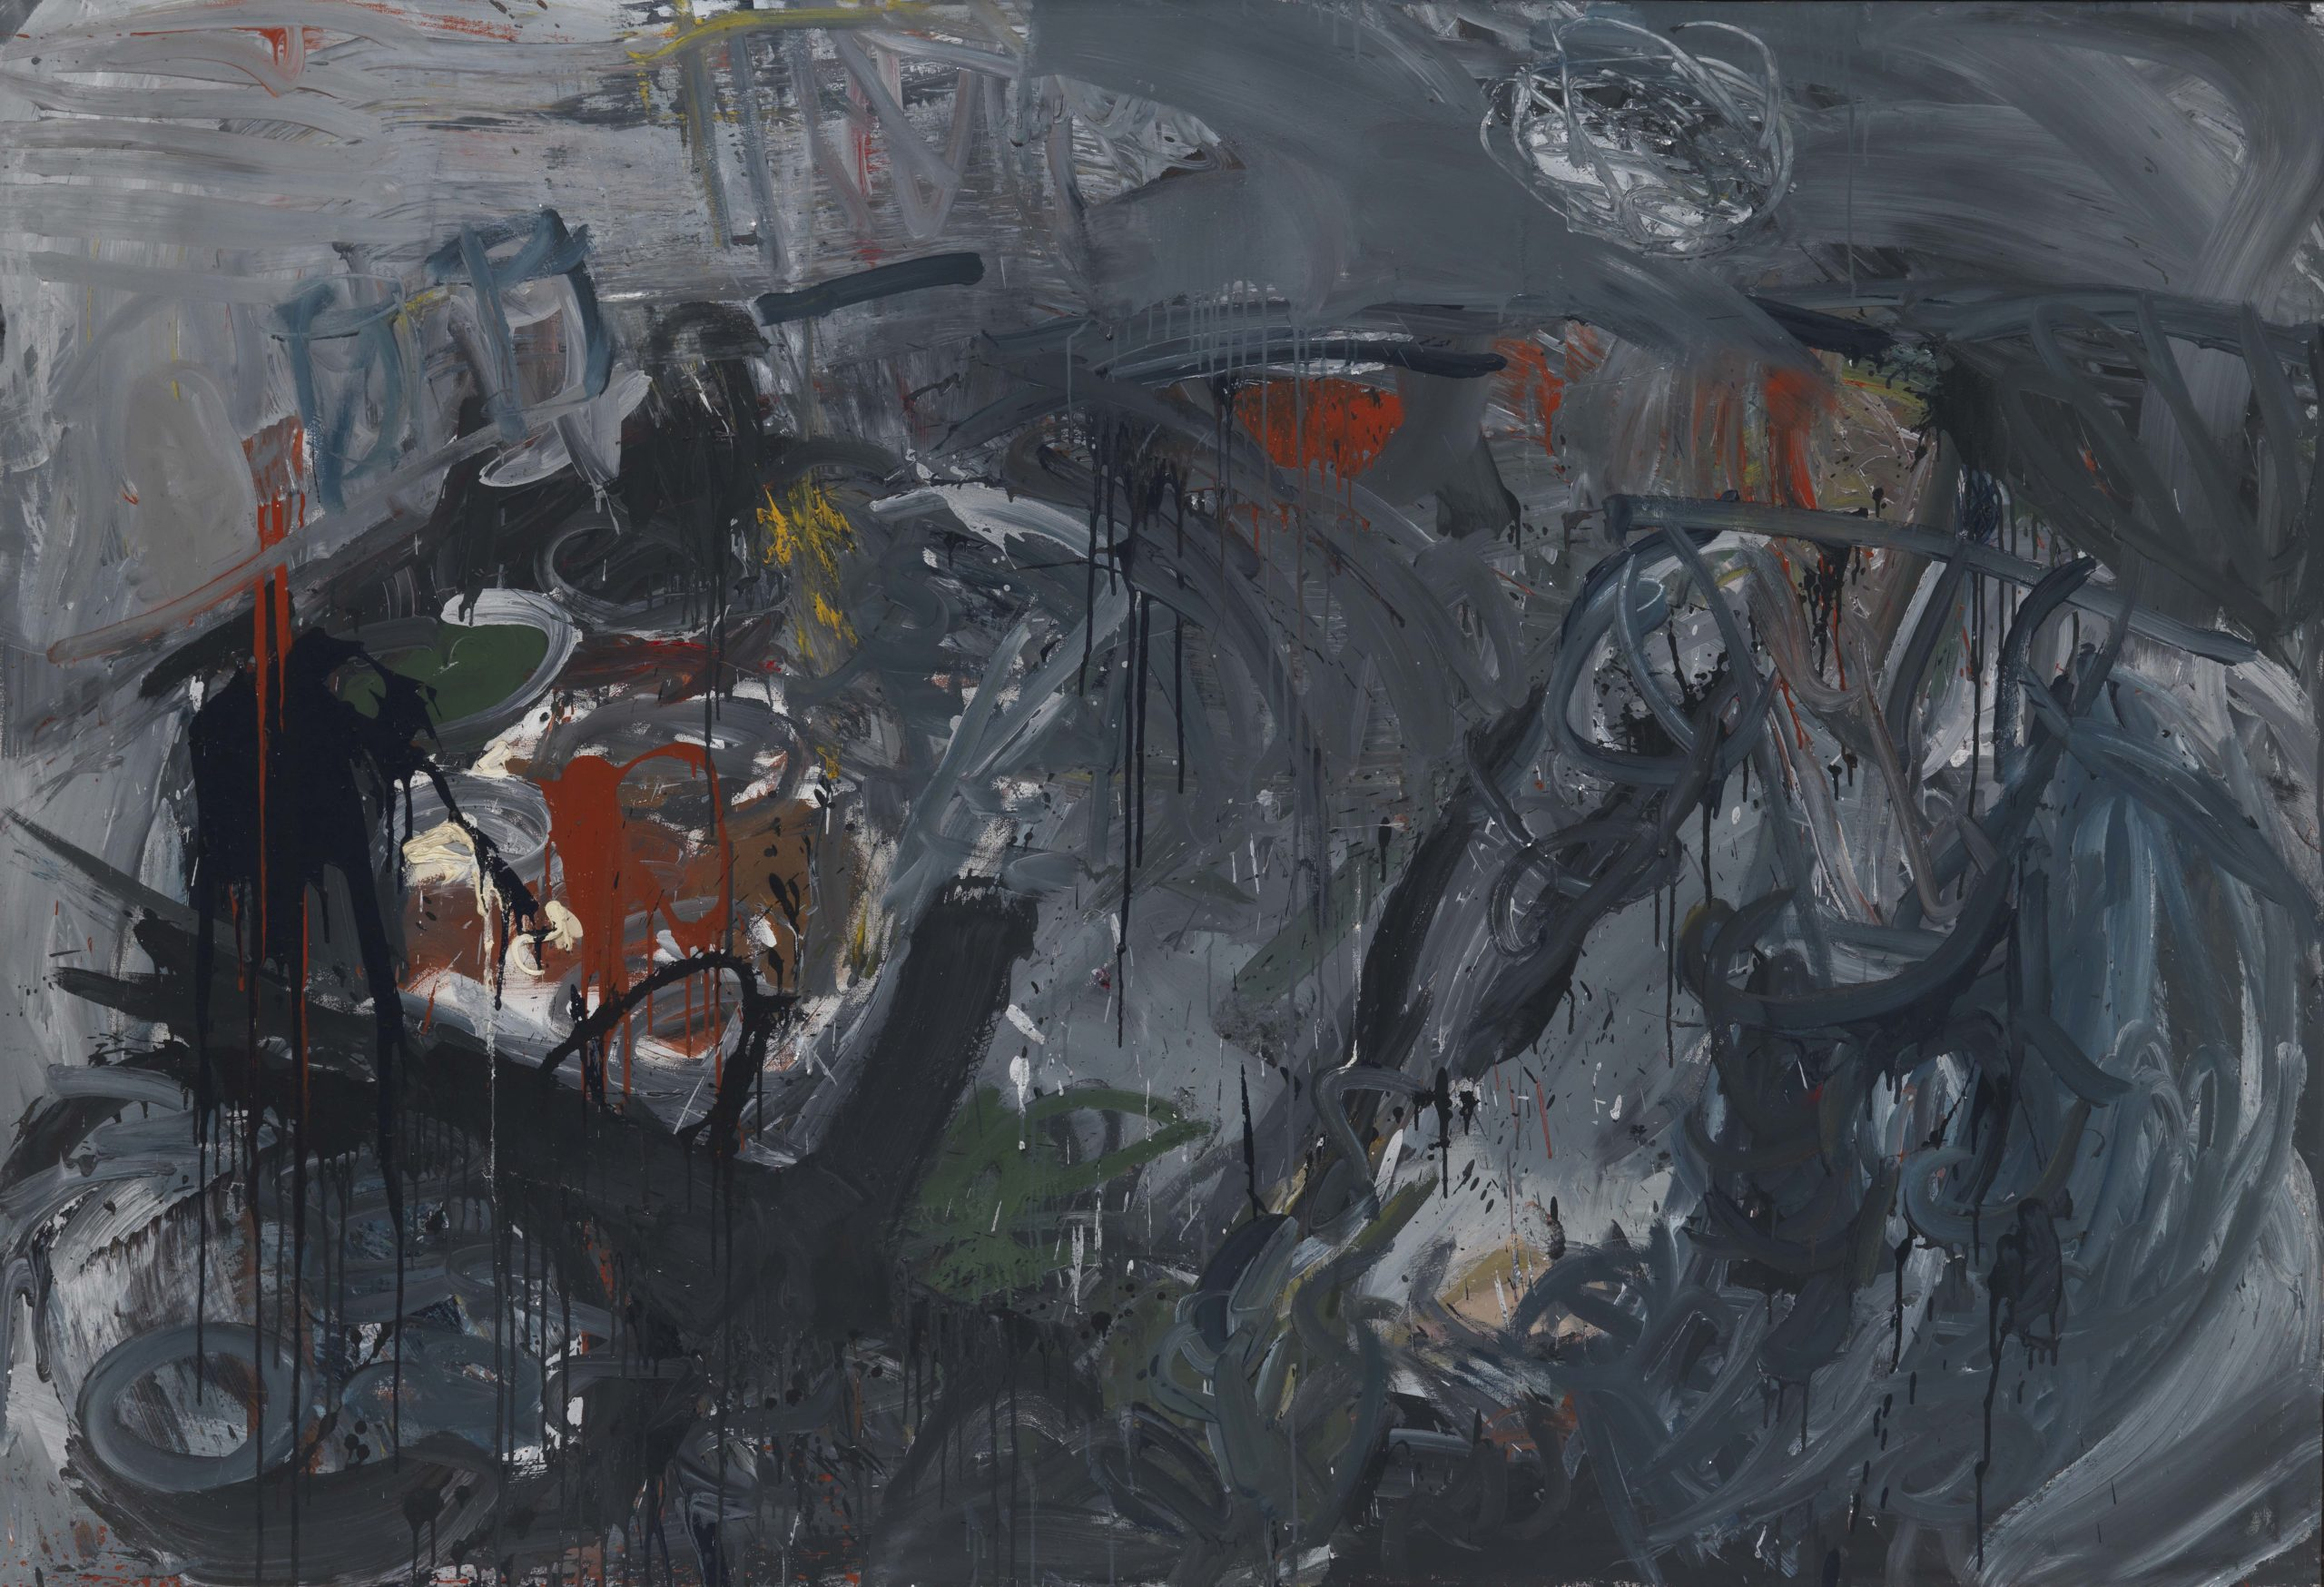 Reinhard Pods, Ohne Titel, 1976, Öl auf Leinwand, 169,8 x 250 cm